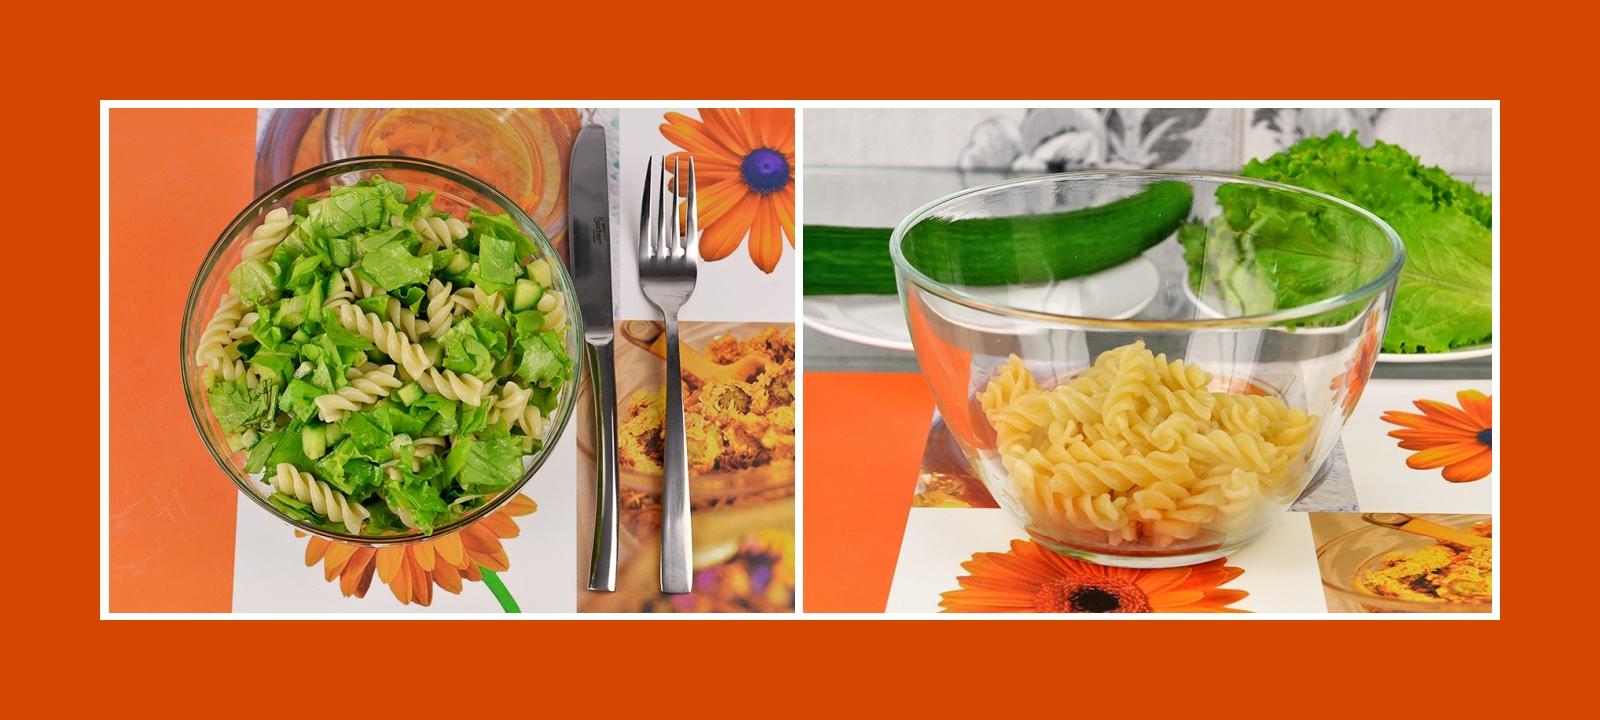 Gekochte Nudeln für grünen Salat